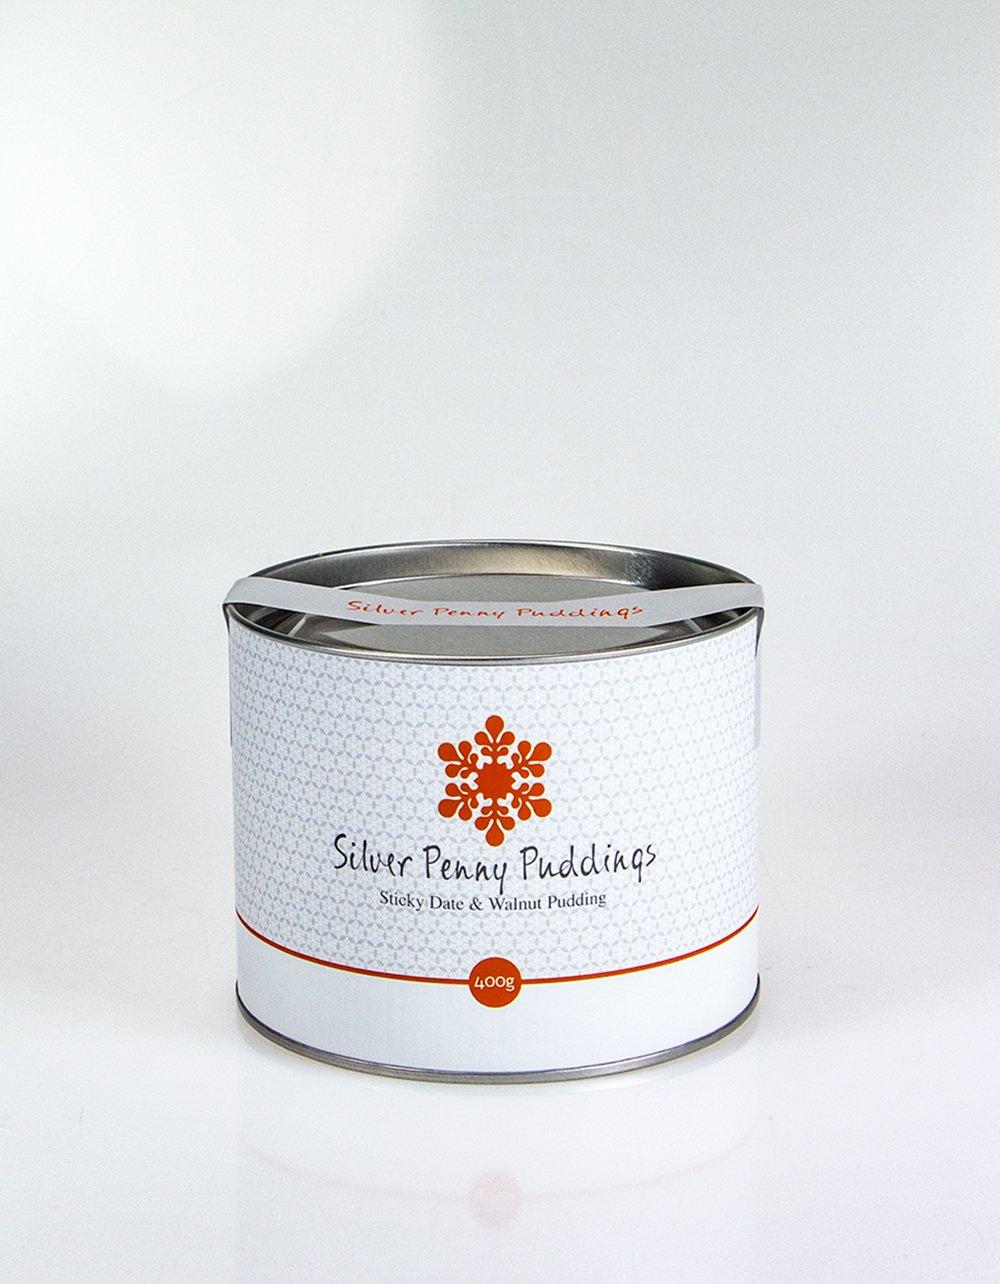 Australian Silver Penny Puddings Sticky Date & Walnut Pudding 400g